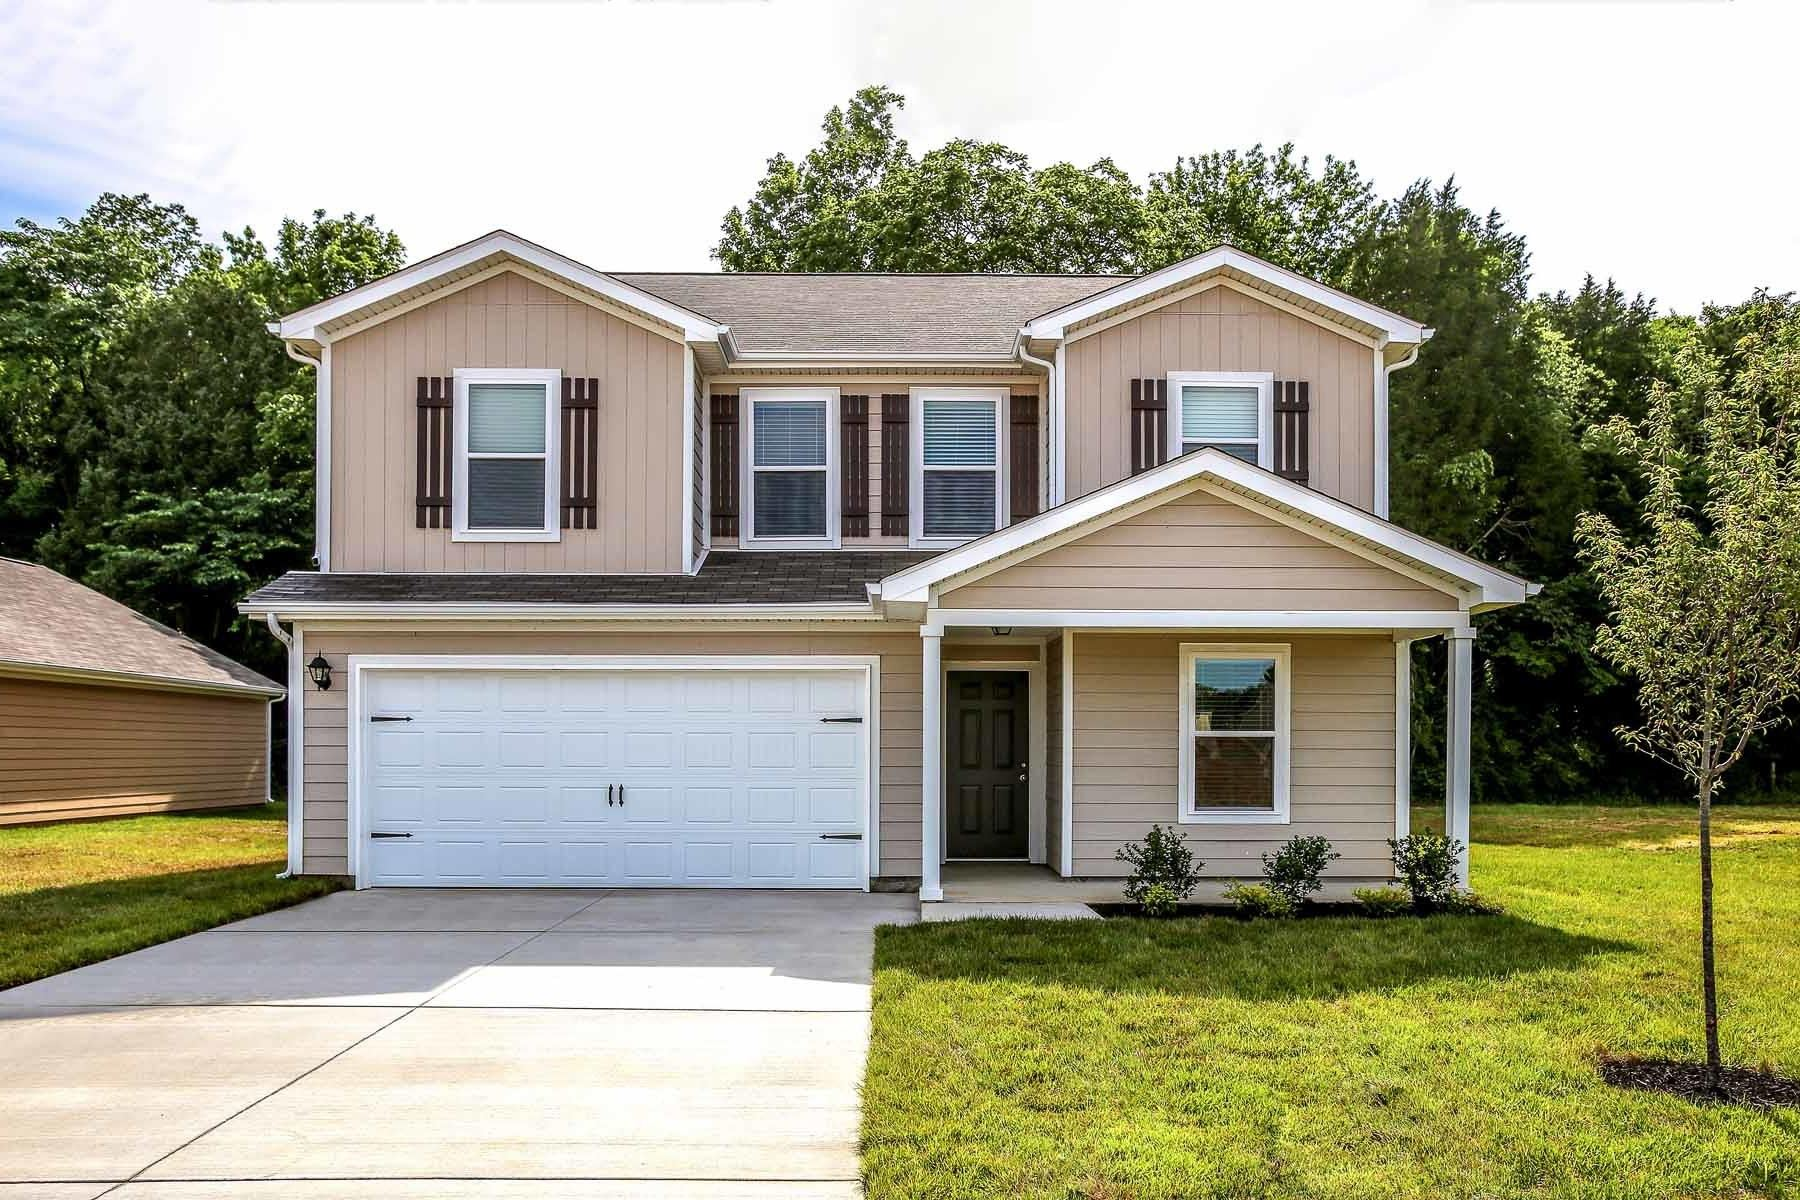 3722 Spahn Lane, Murfreesboro, TN 37128 - MLS#: 2143437